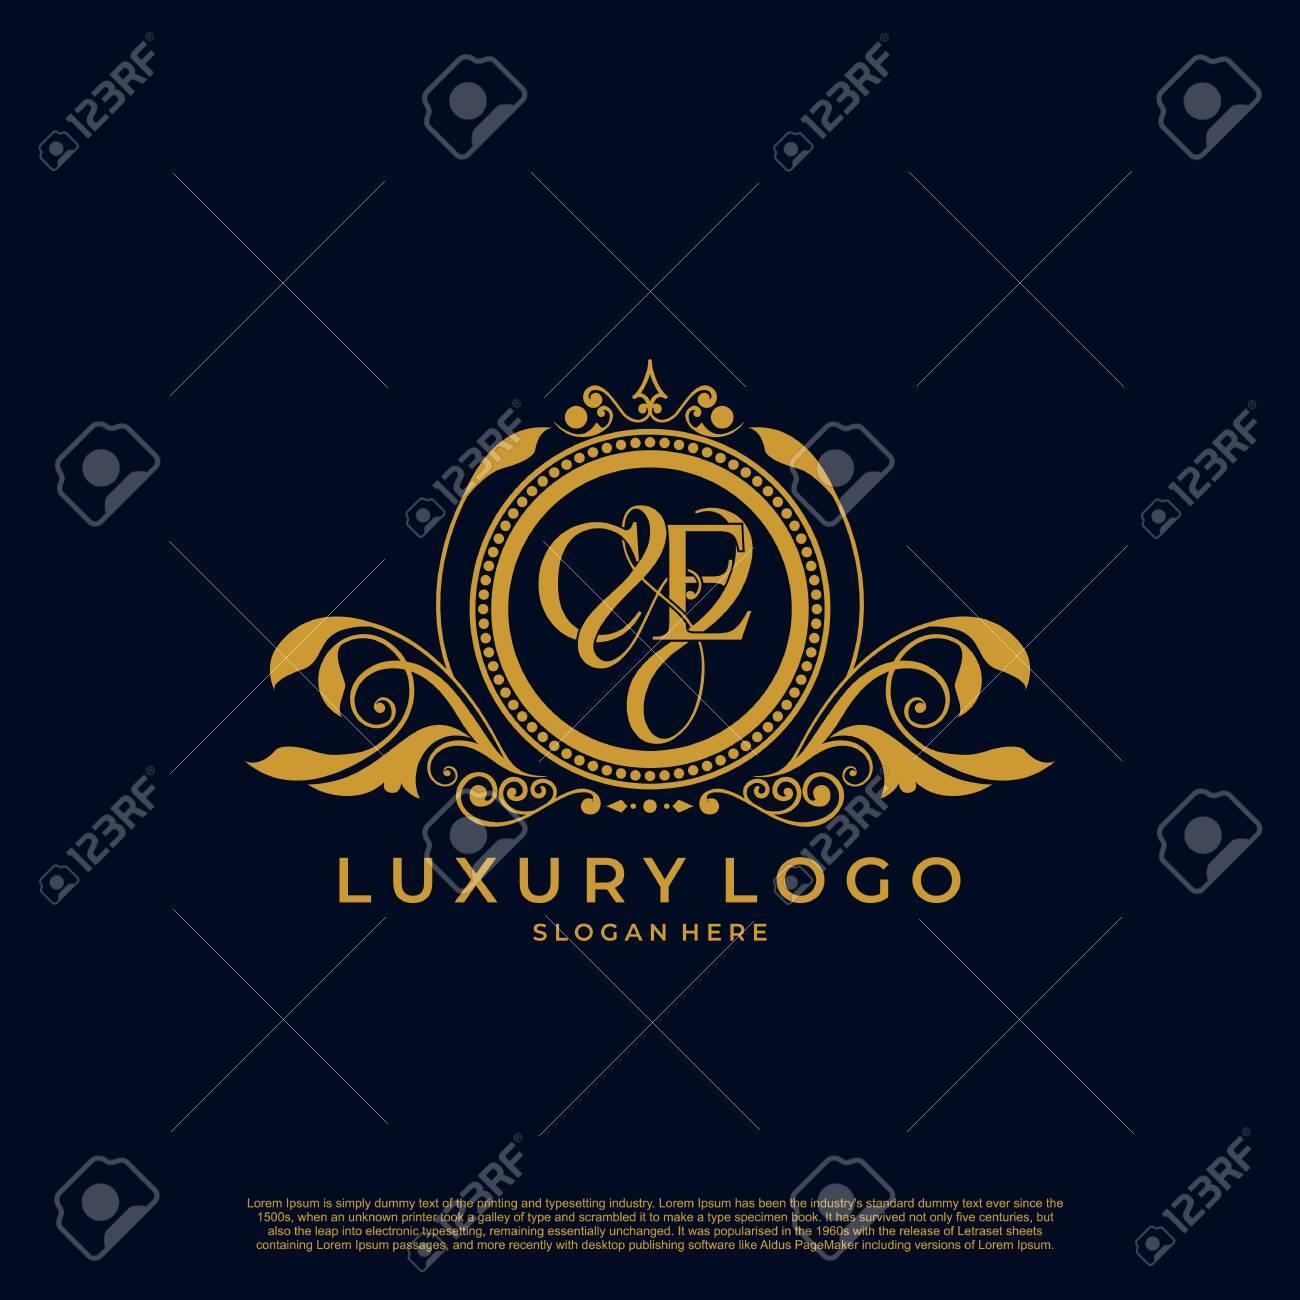 Logo Initial letter CE luxury vector mark, gold color elegant classical symmetric curves decor. - 135816430